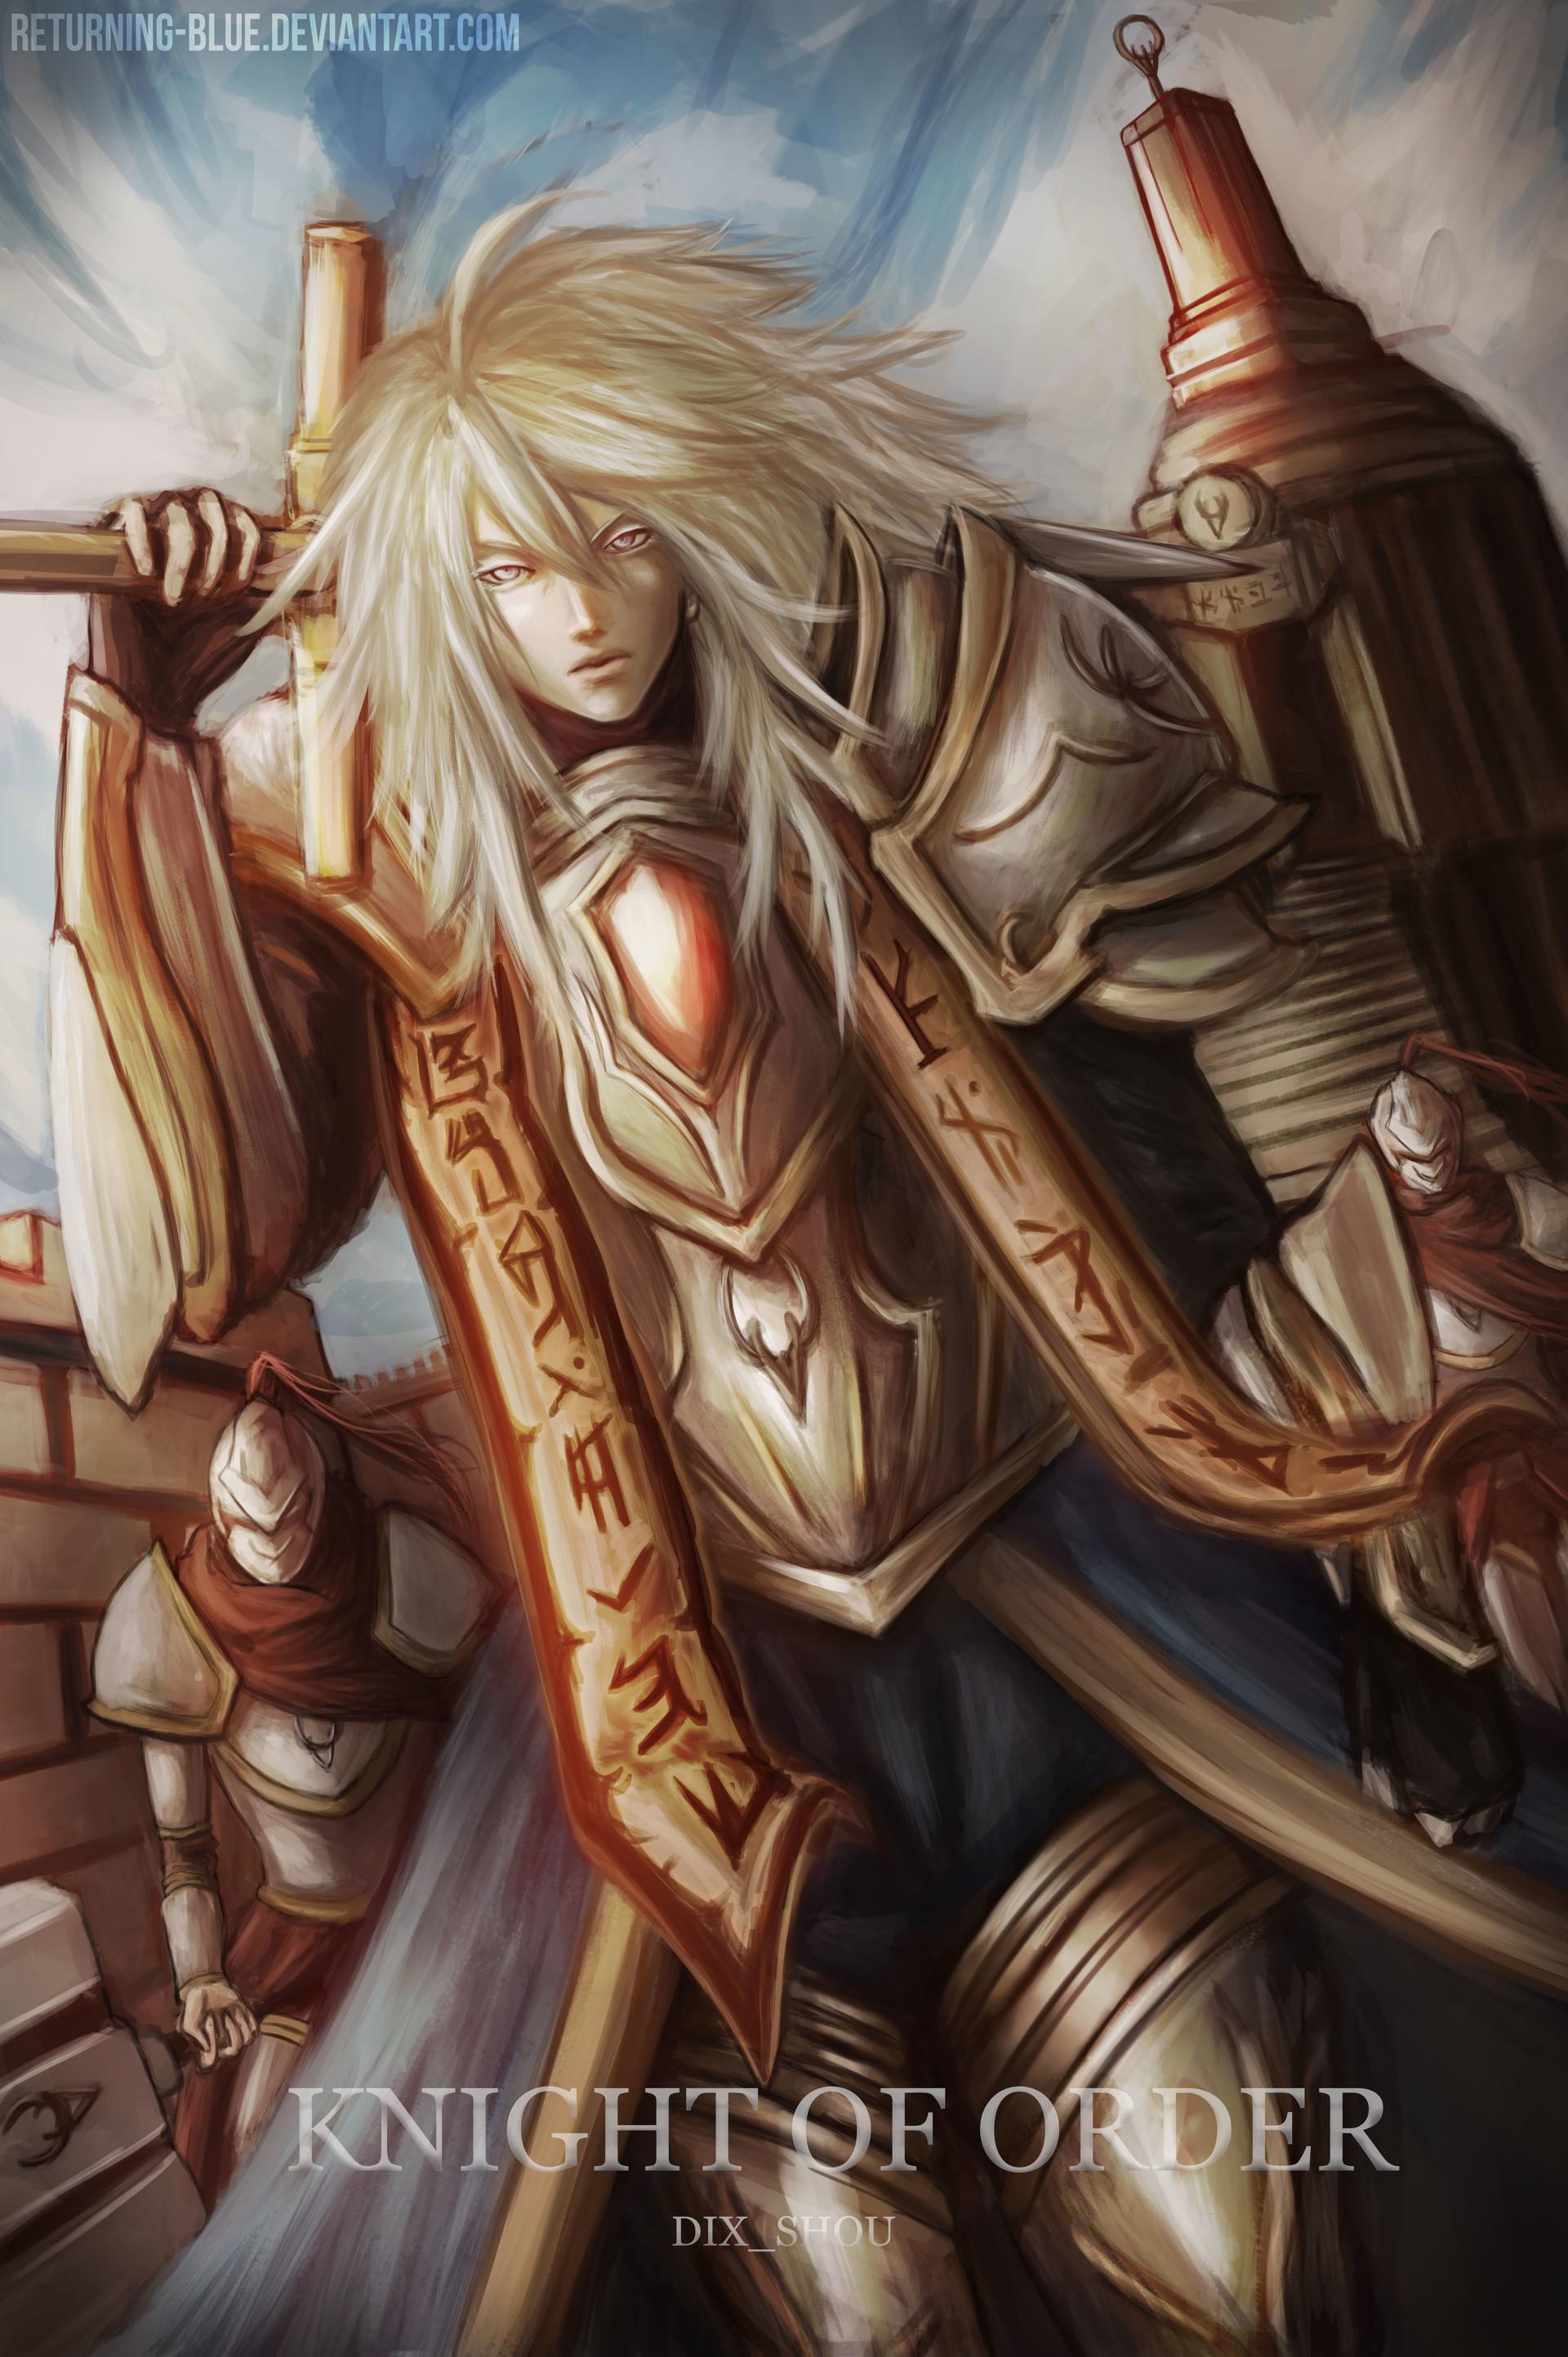 Dix shou knight of order final